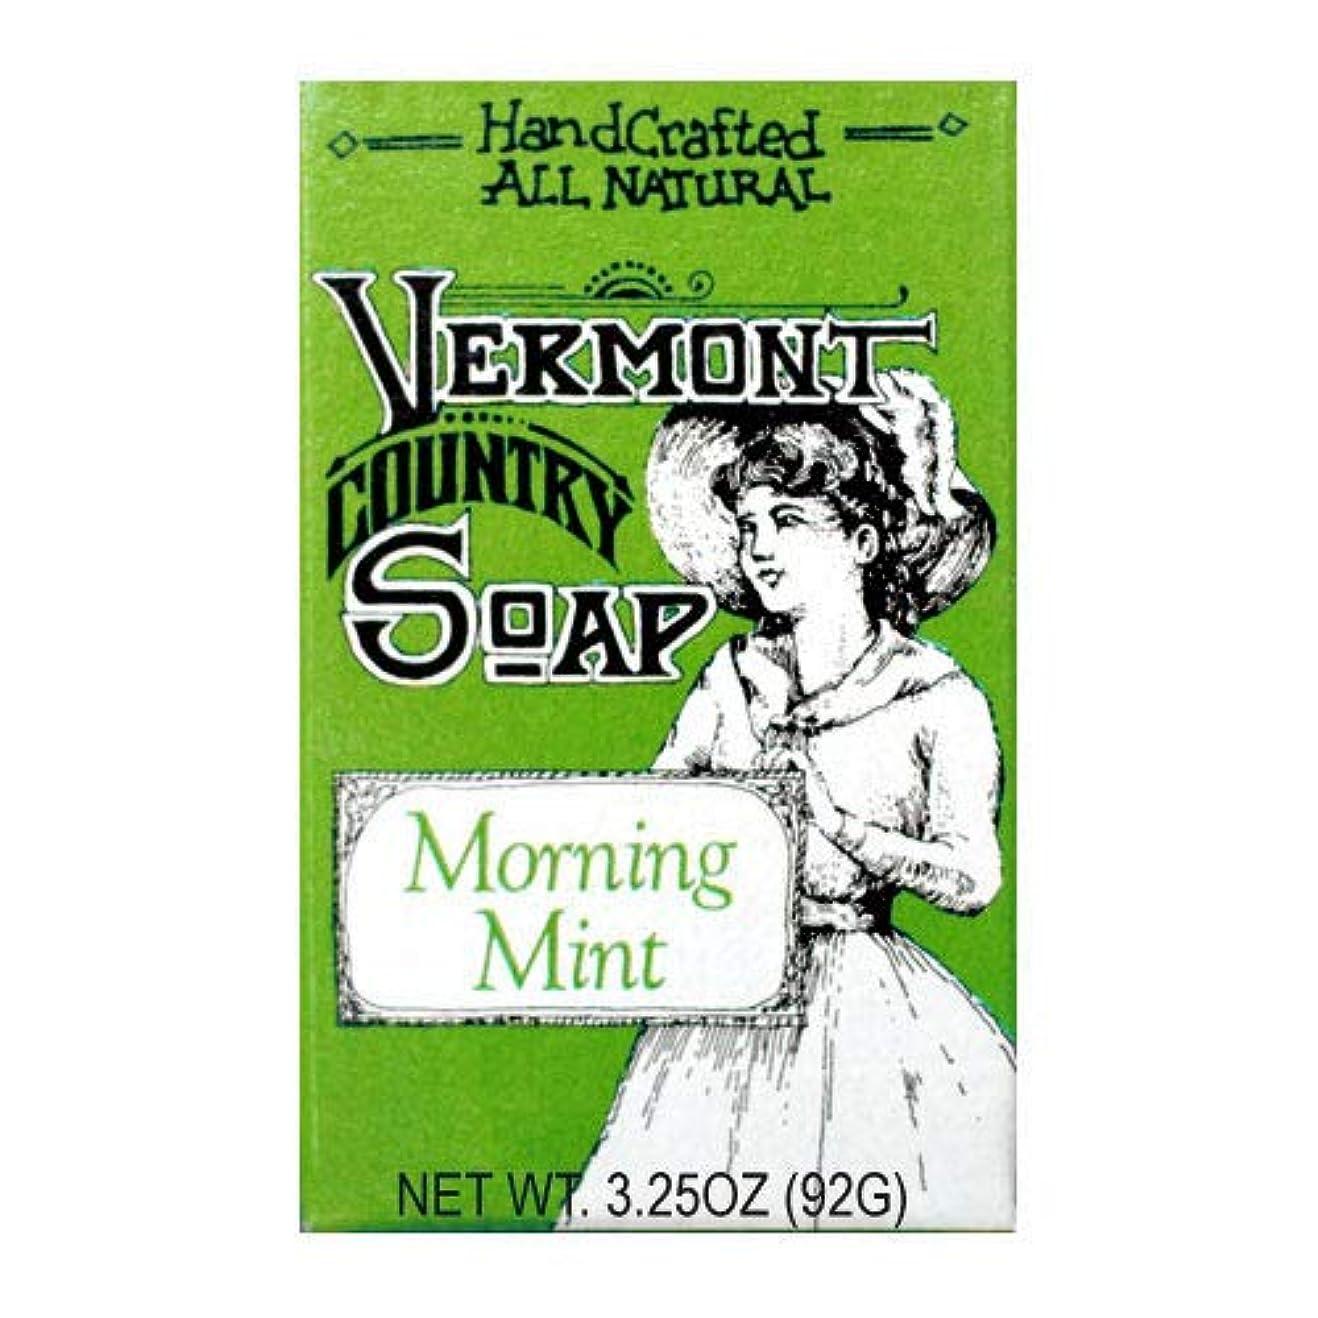 VermontSoap バーモントカントリーソープ 6種類 (モーニング ミント) 92g オーガニック石けん 洗顔 ボディー